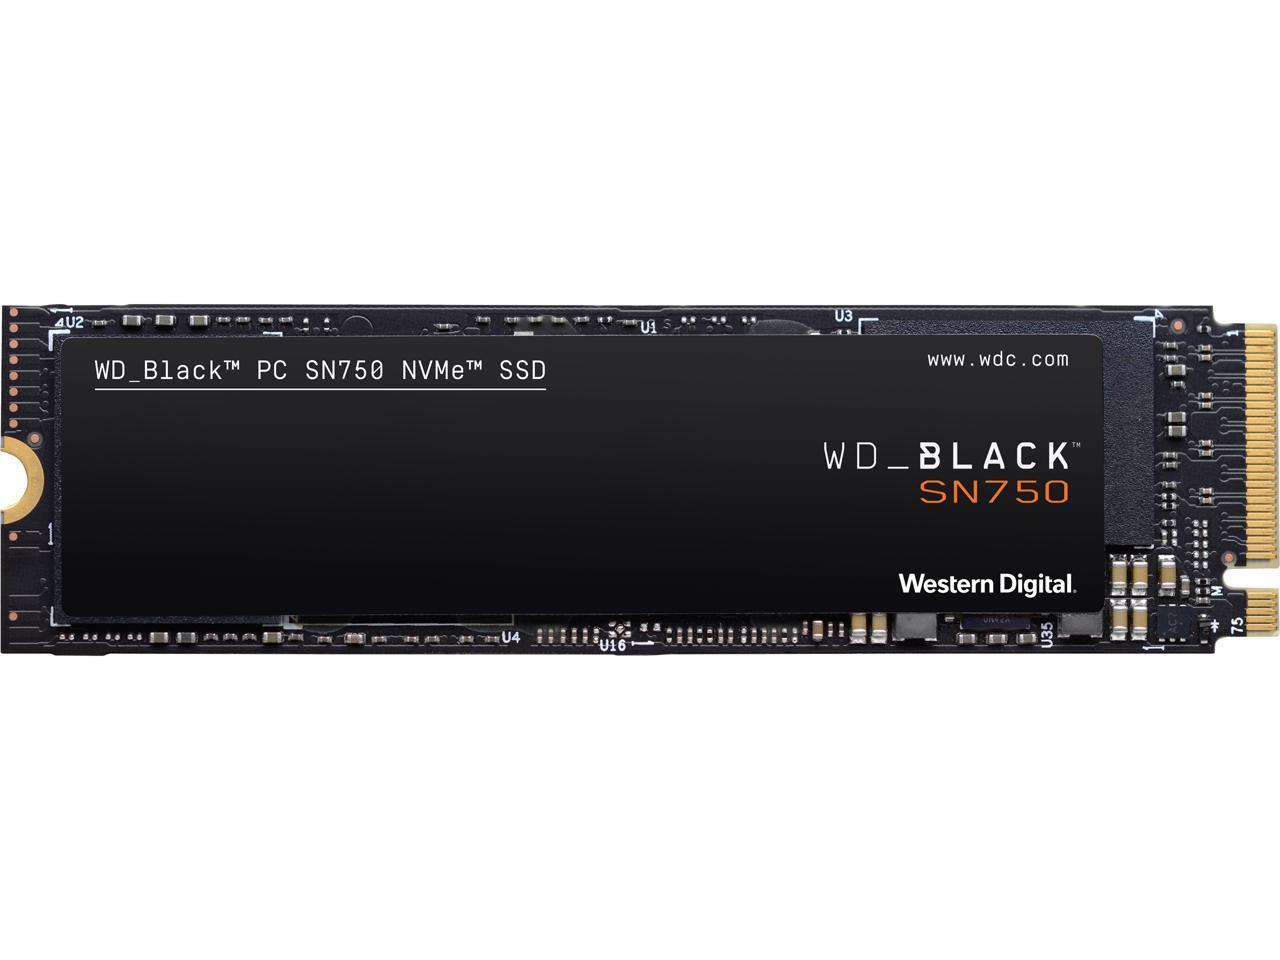 WD Black SN750 PCIe NVMe 3.0 1TB M.2 2280 Internal Solid State Drive (SSD) WDS100T3X0C